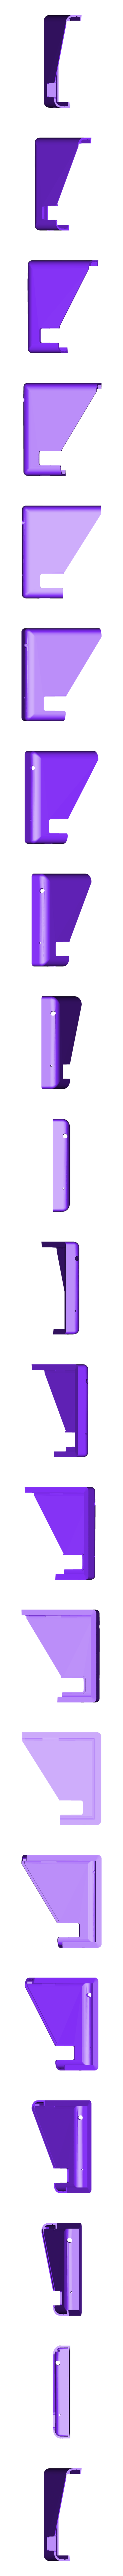 cova108_top.stl Download free STL file Fairphone 2 cover • 3D printer model, unwohlpol